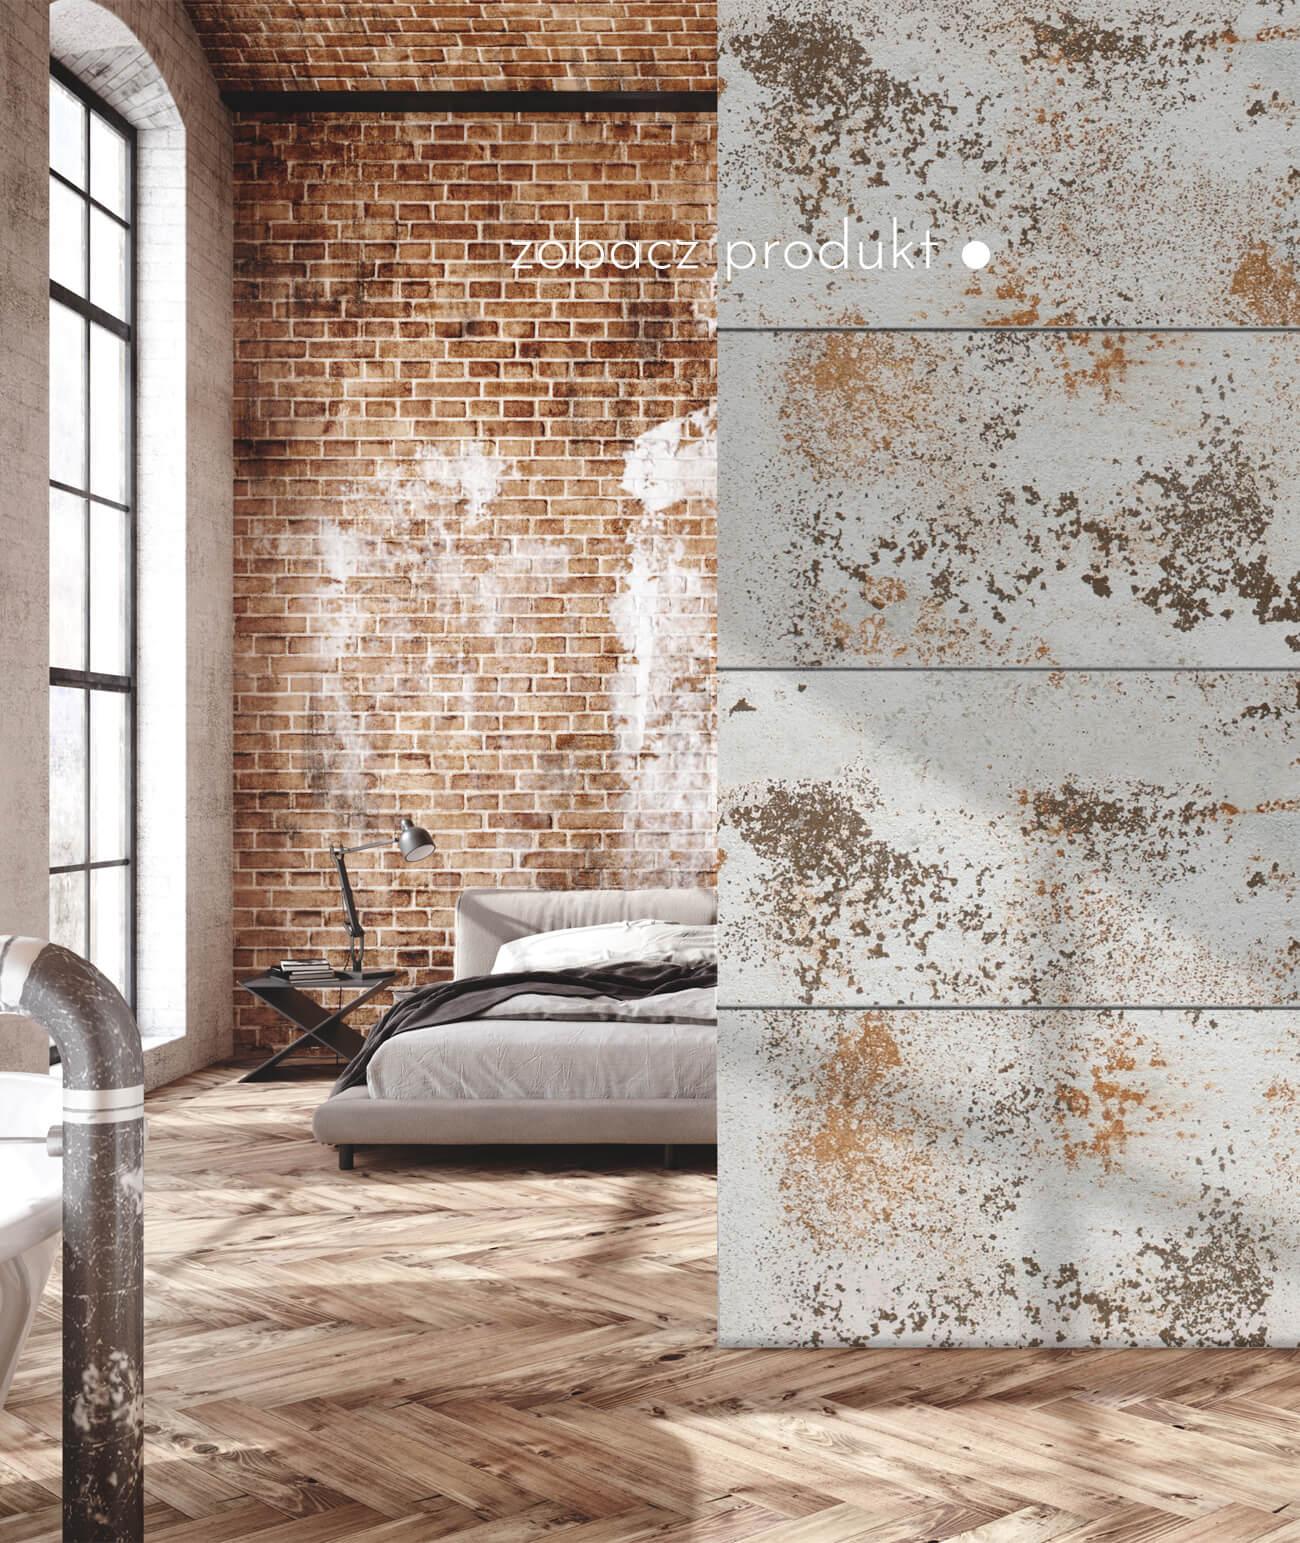 plyty-betonowe-scienne-i-elewacyjne-beton-architektoniczny_1124-24195-ds-bialy-corten---plyta-beton-architektoniczny-grc-ultralekka-ultralekka